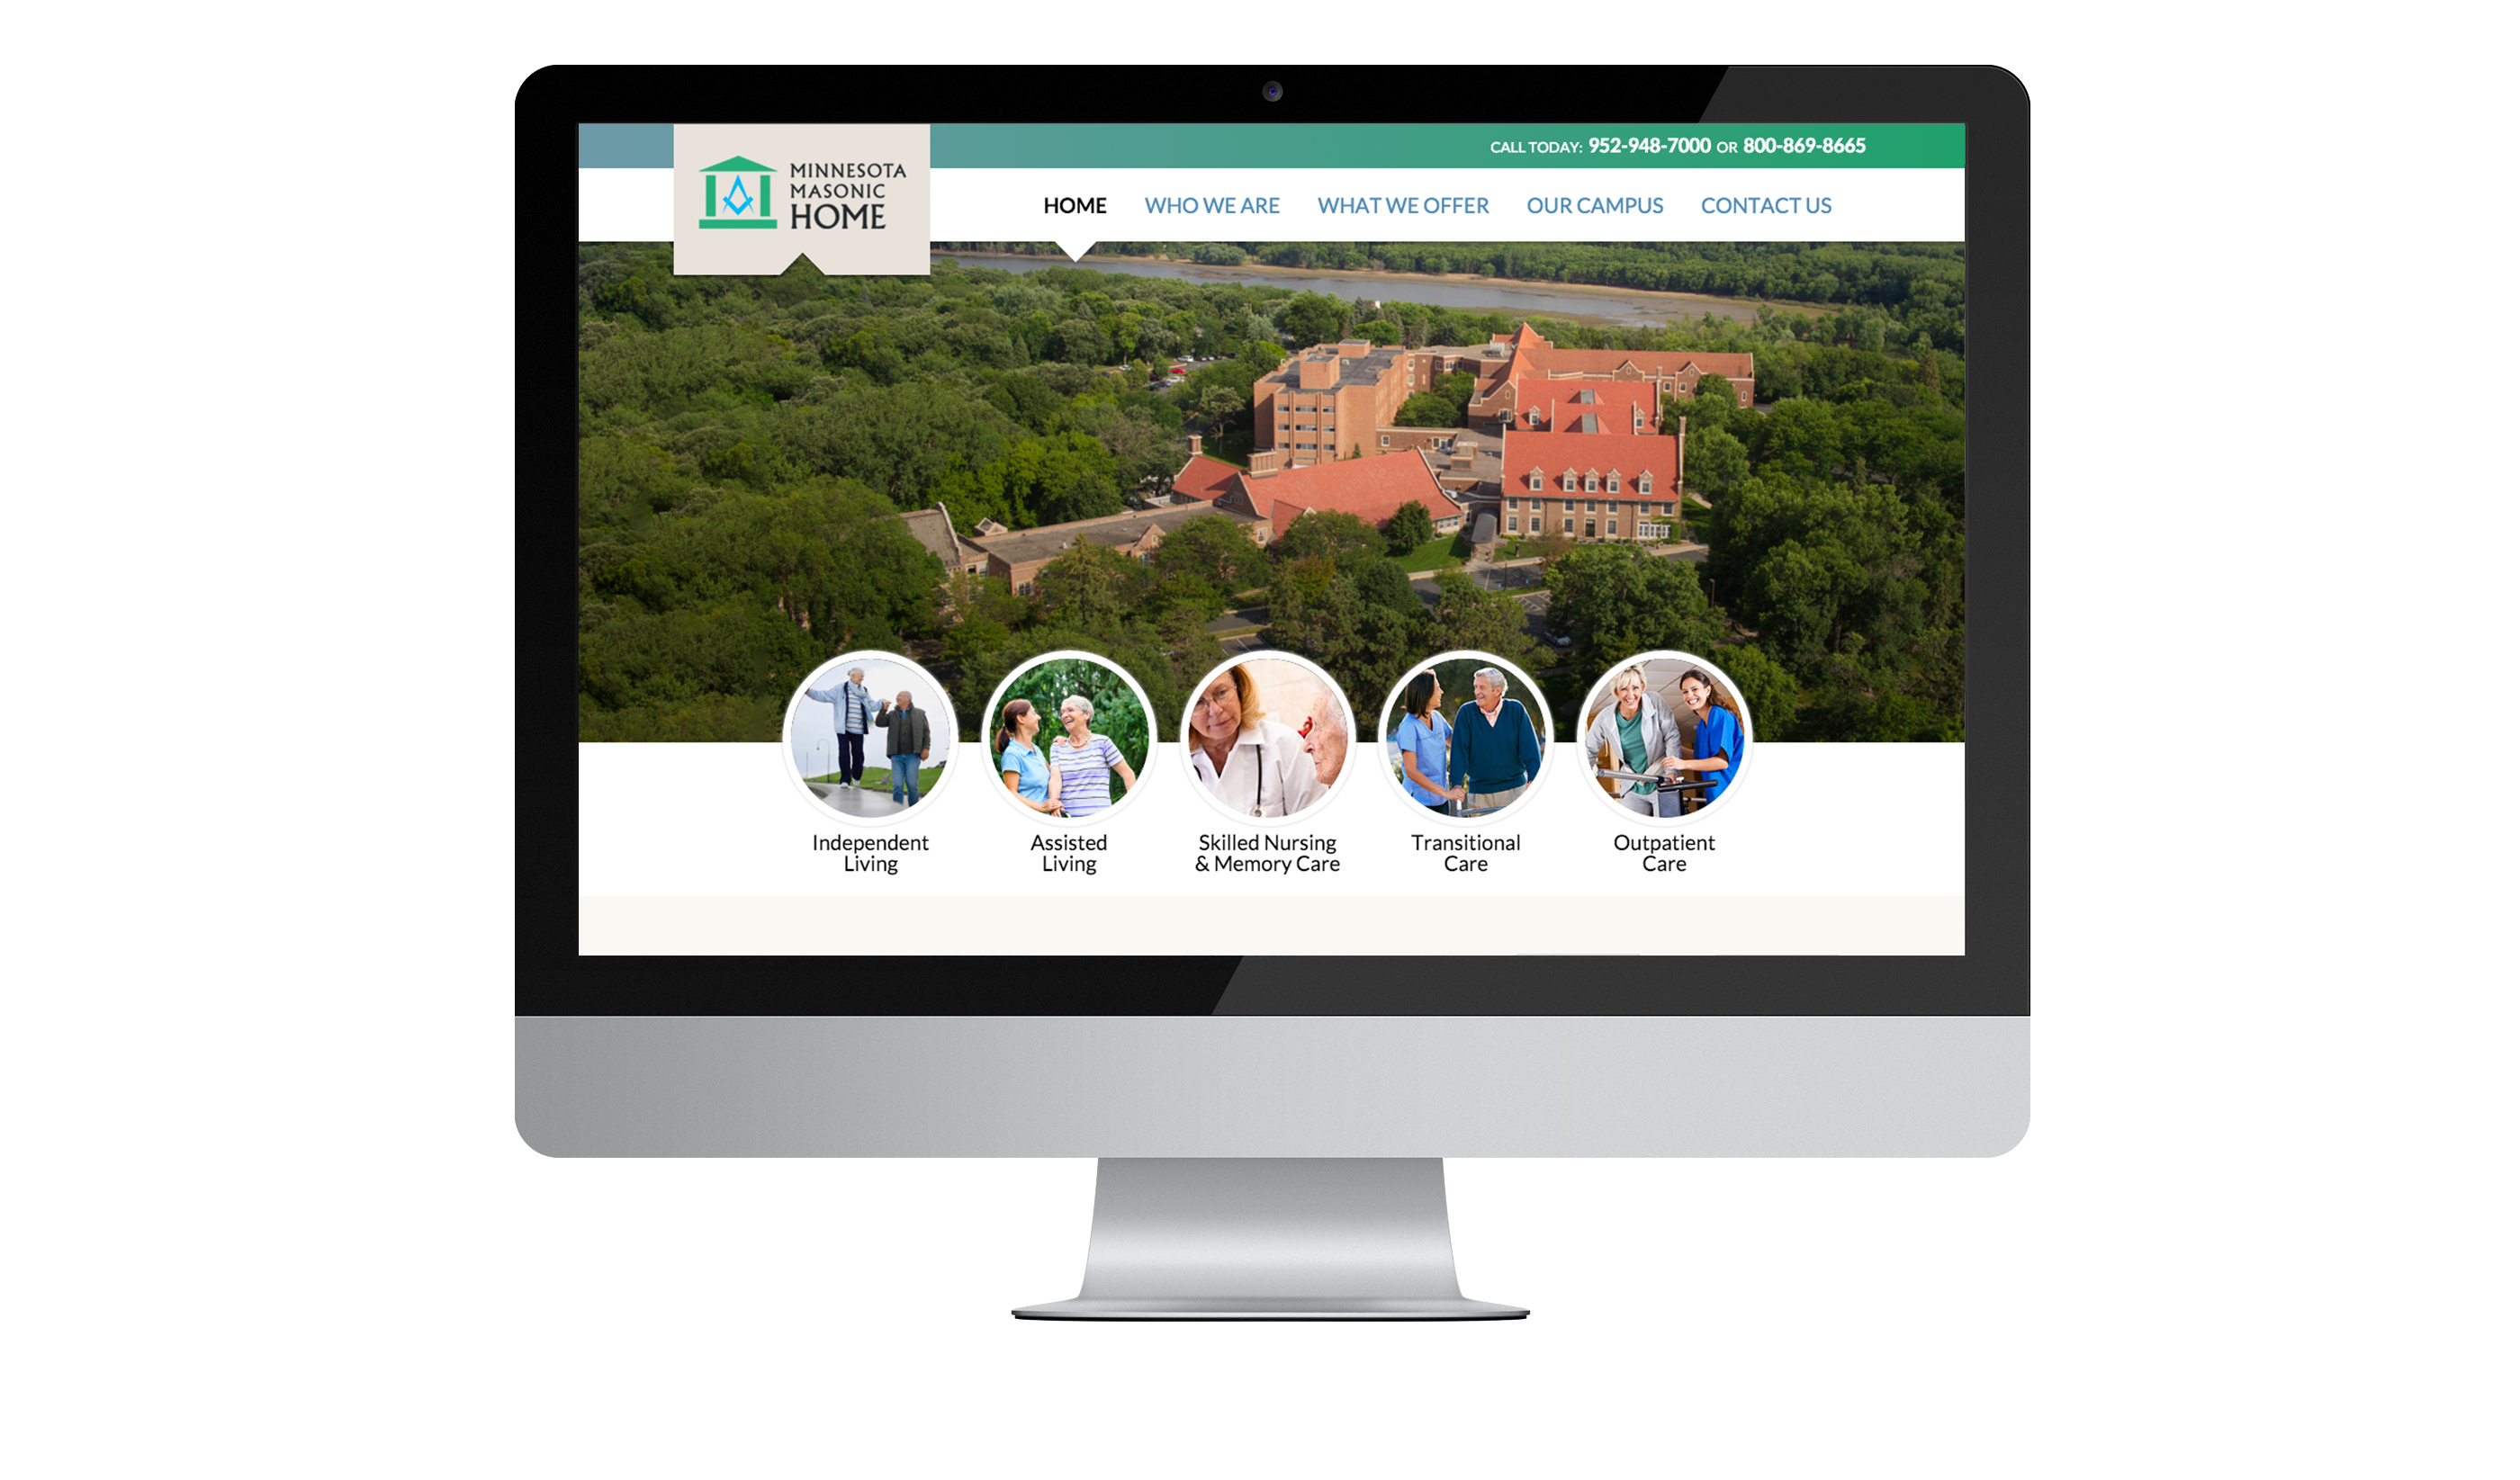 Minnesota Masonic Home Website on Mac Desktop Screen